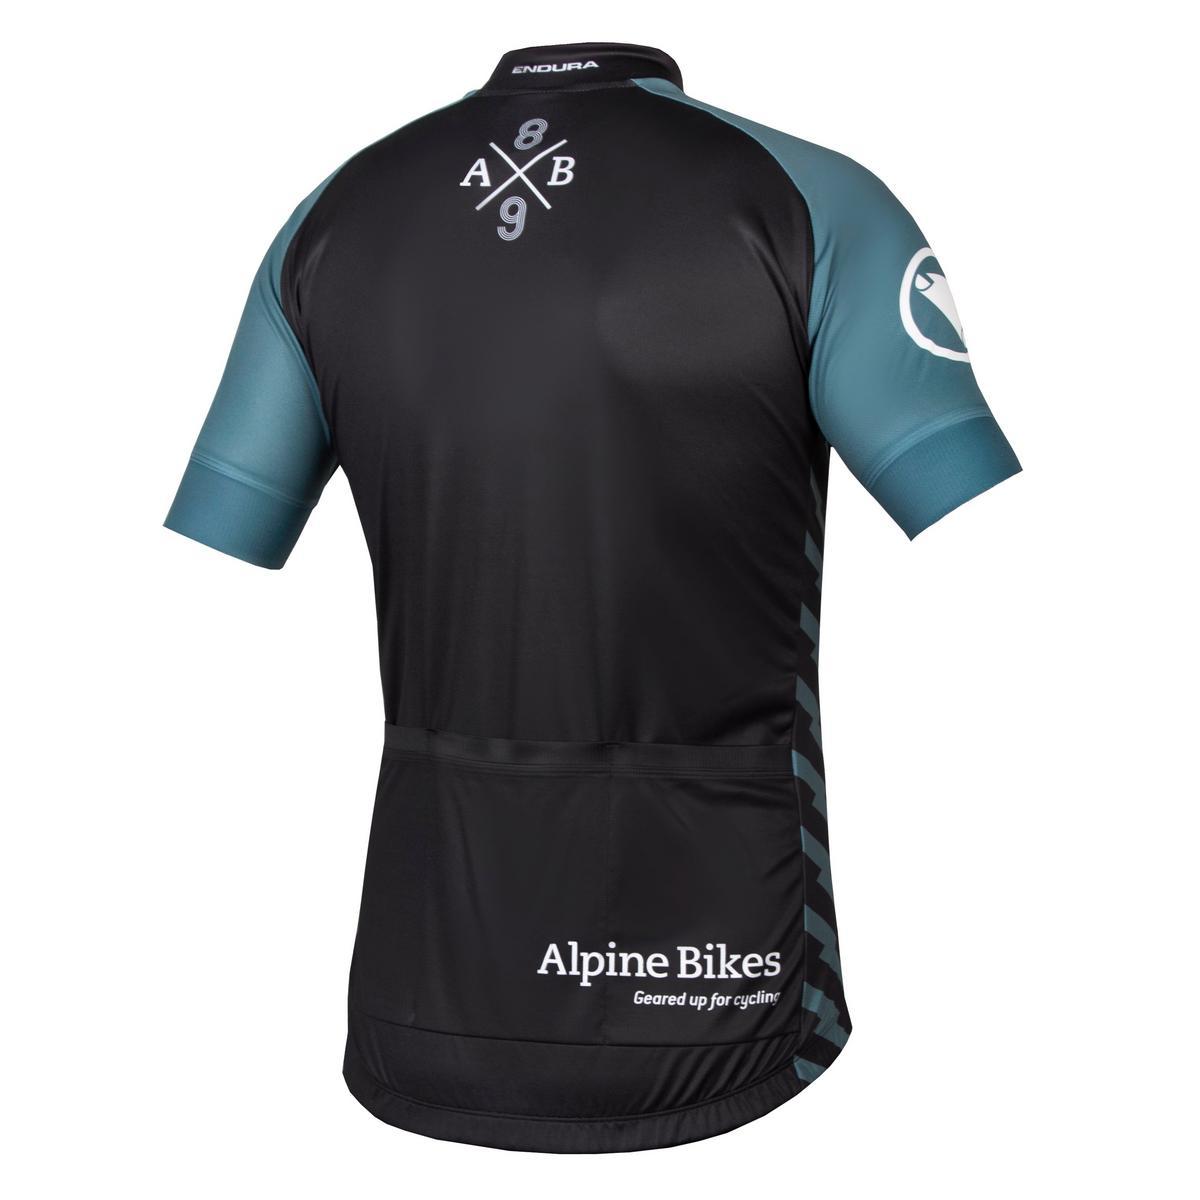 Endura Alpine Bikes 1989 Pro SL S/S Jersey